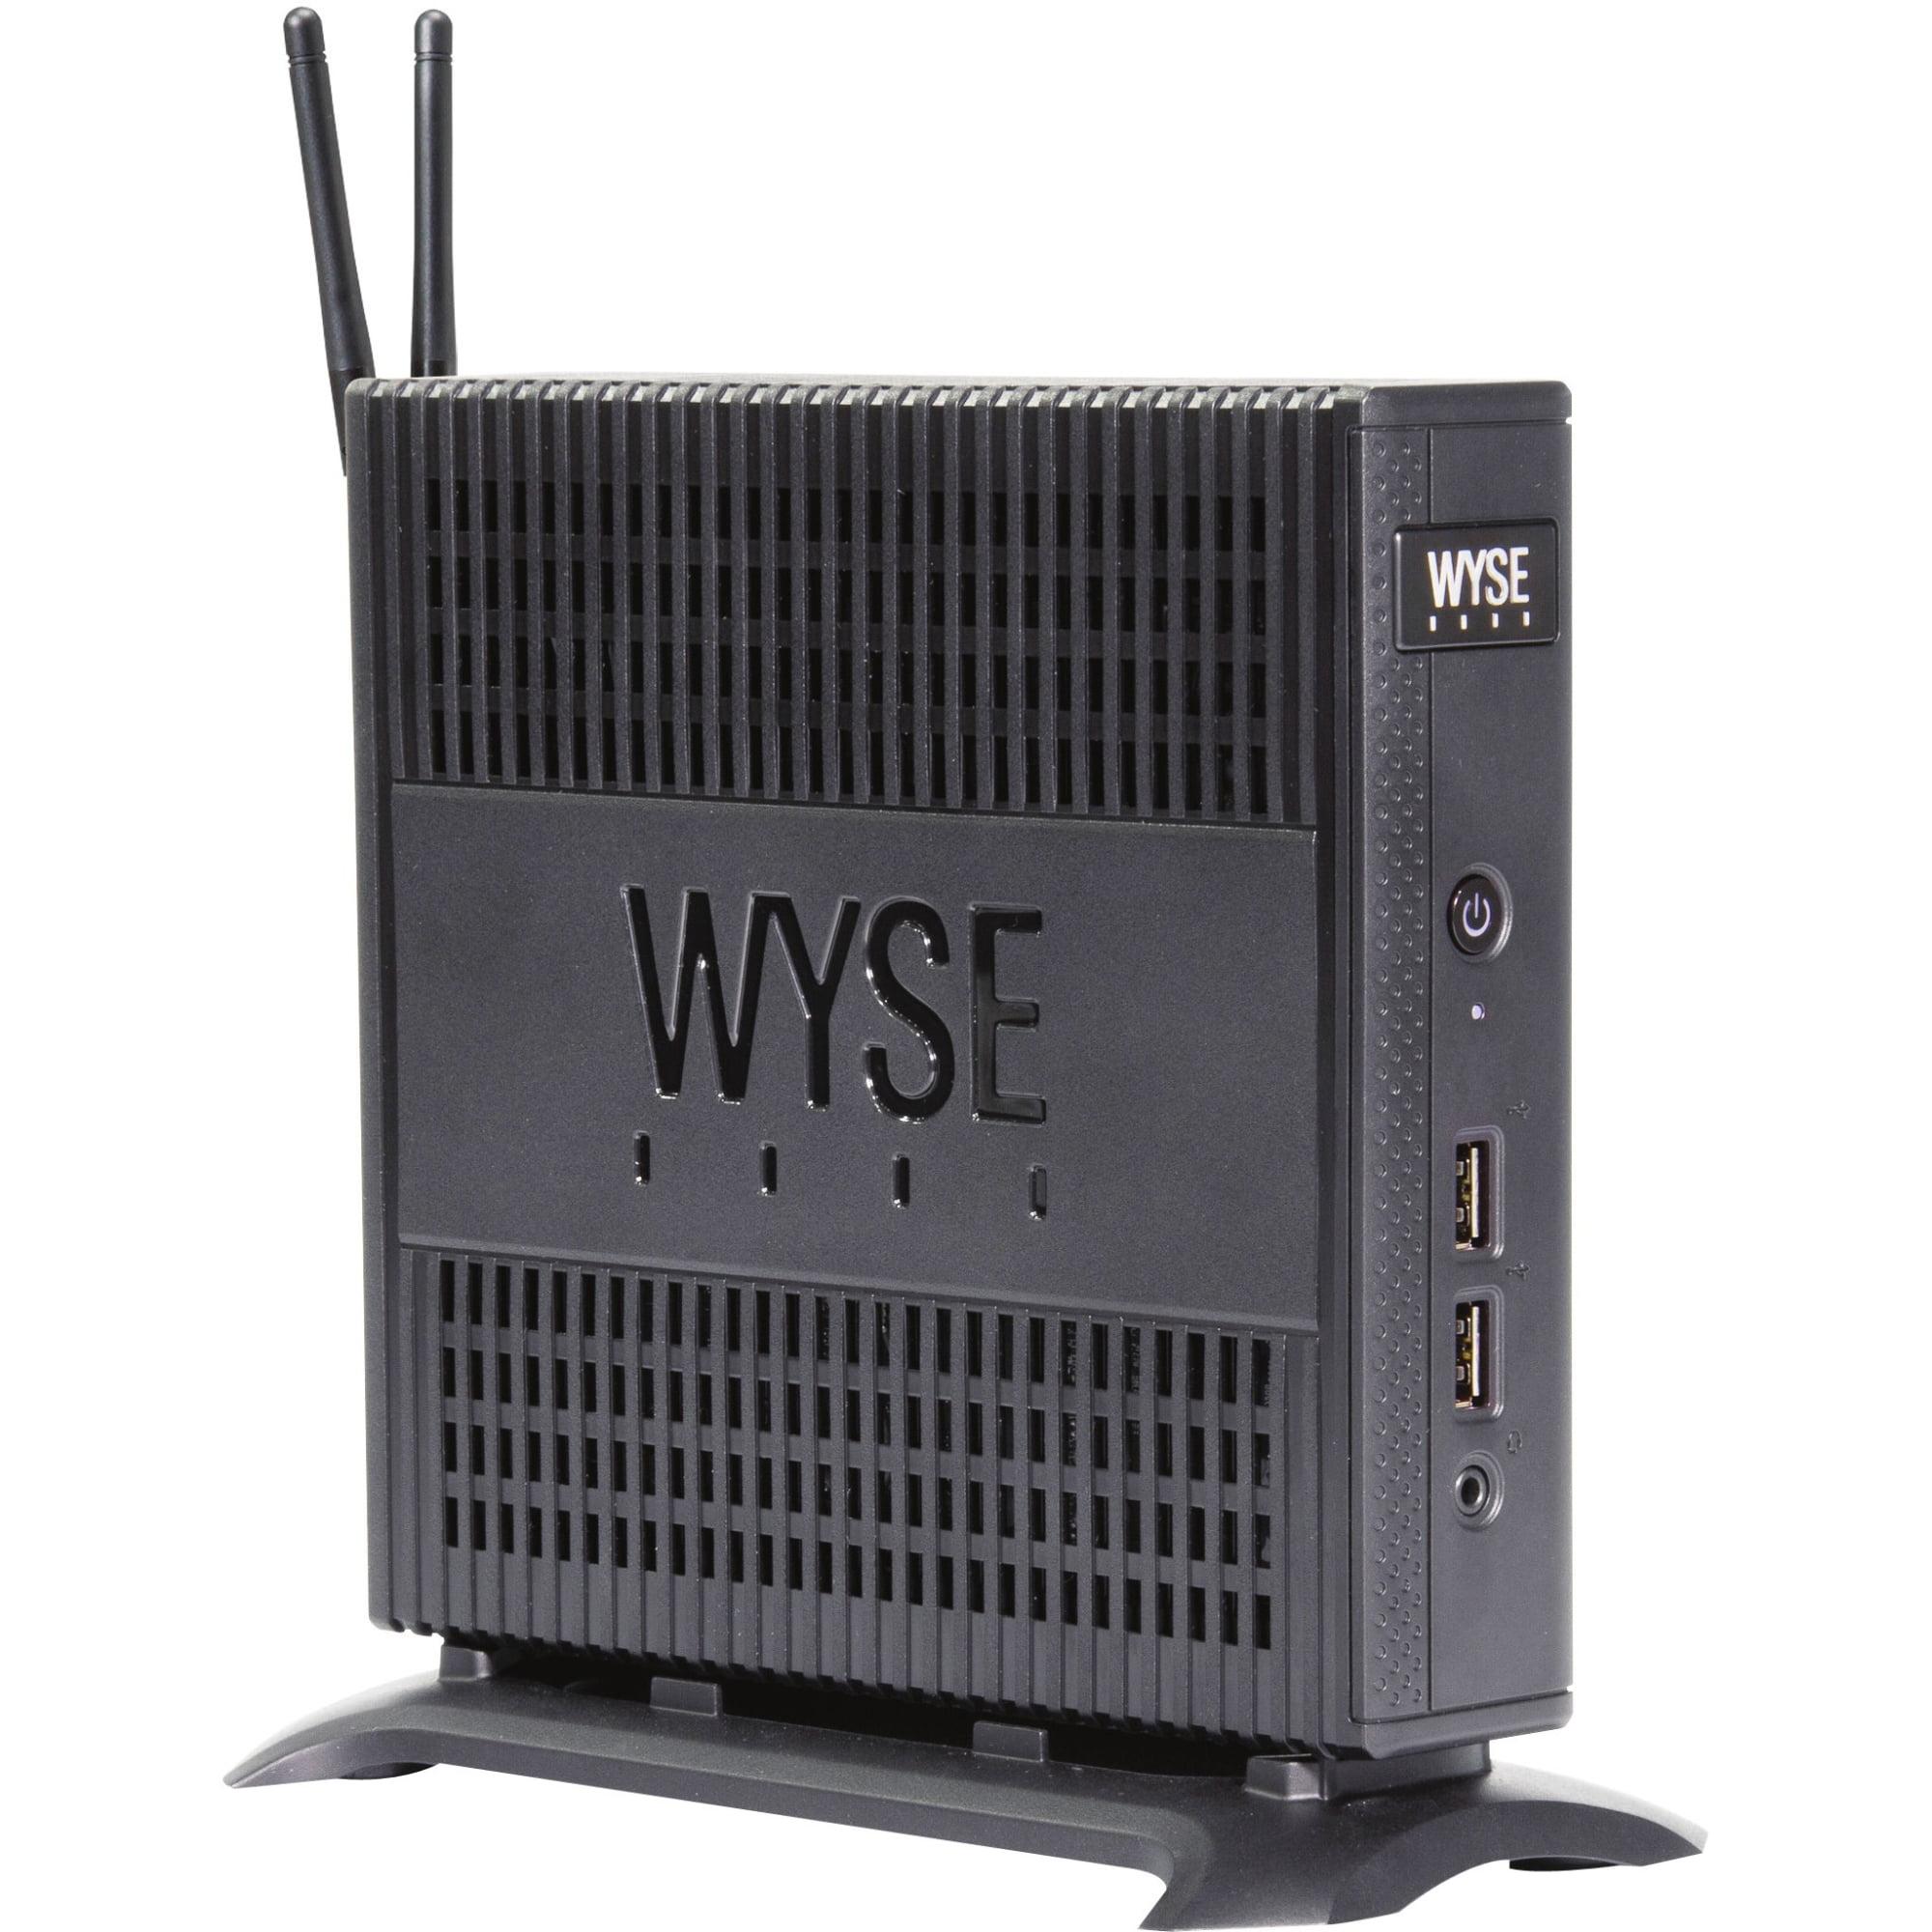 Wyse 909833-01L 5012-D10D Slimline Thin Client - AMD T48E 1.4 GHz (Refurbished)